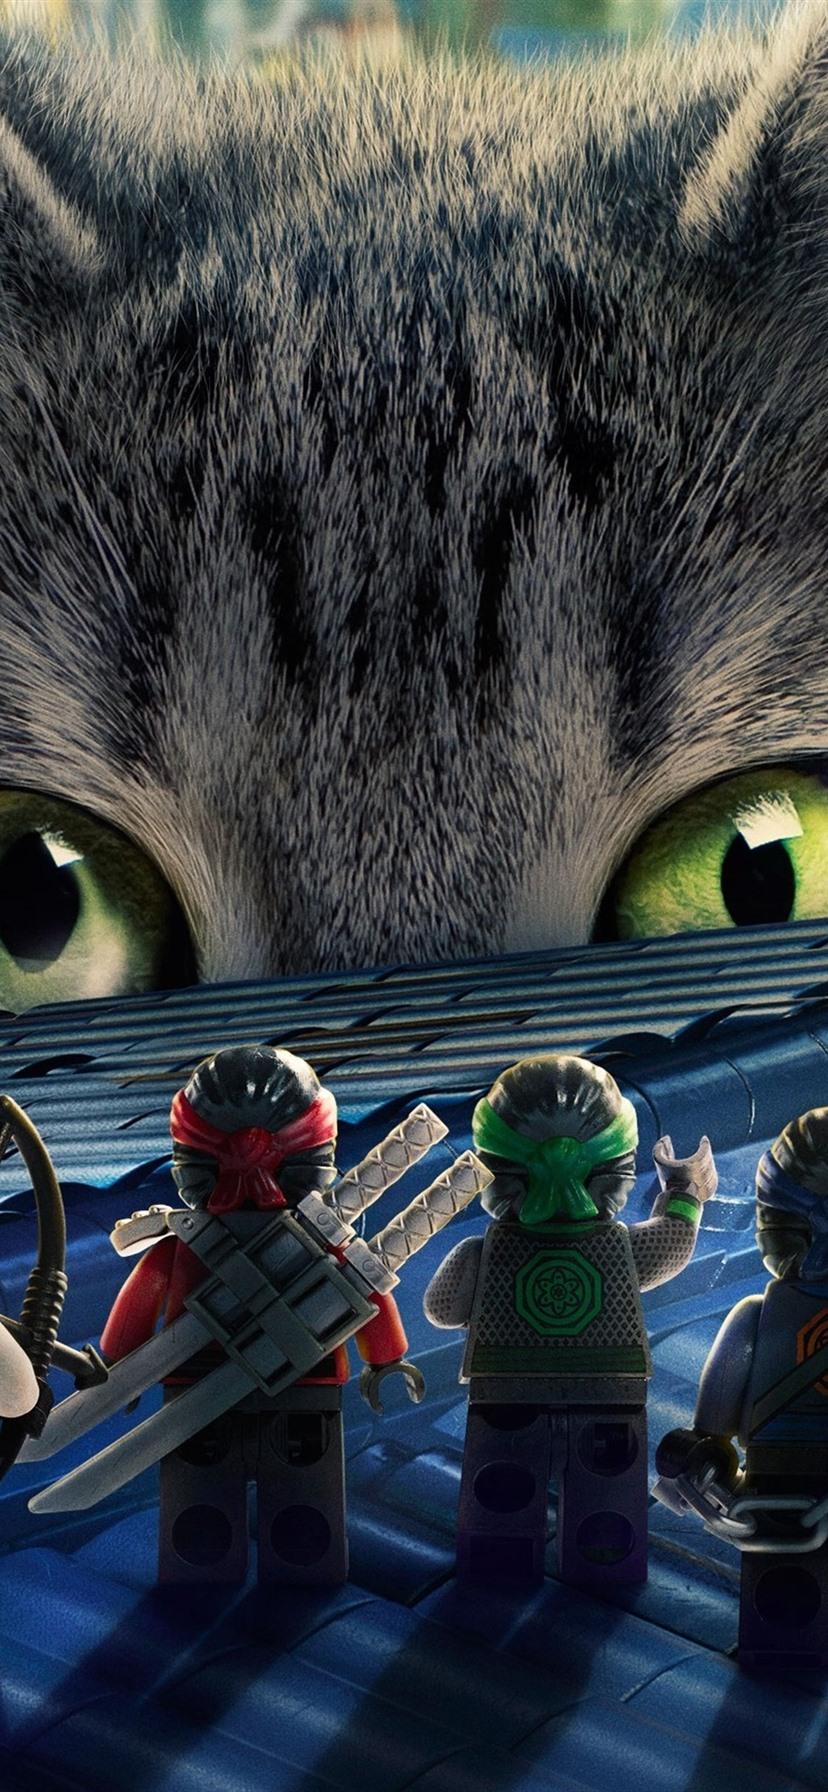 Lego movie ninjago and big cat 1080x1920 iphone 8 7 6 6s - Ninjago phone wallpaper ...